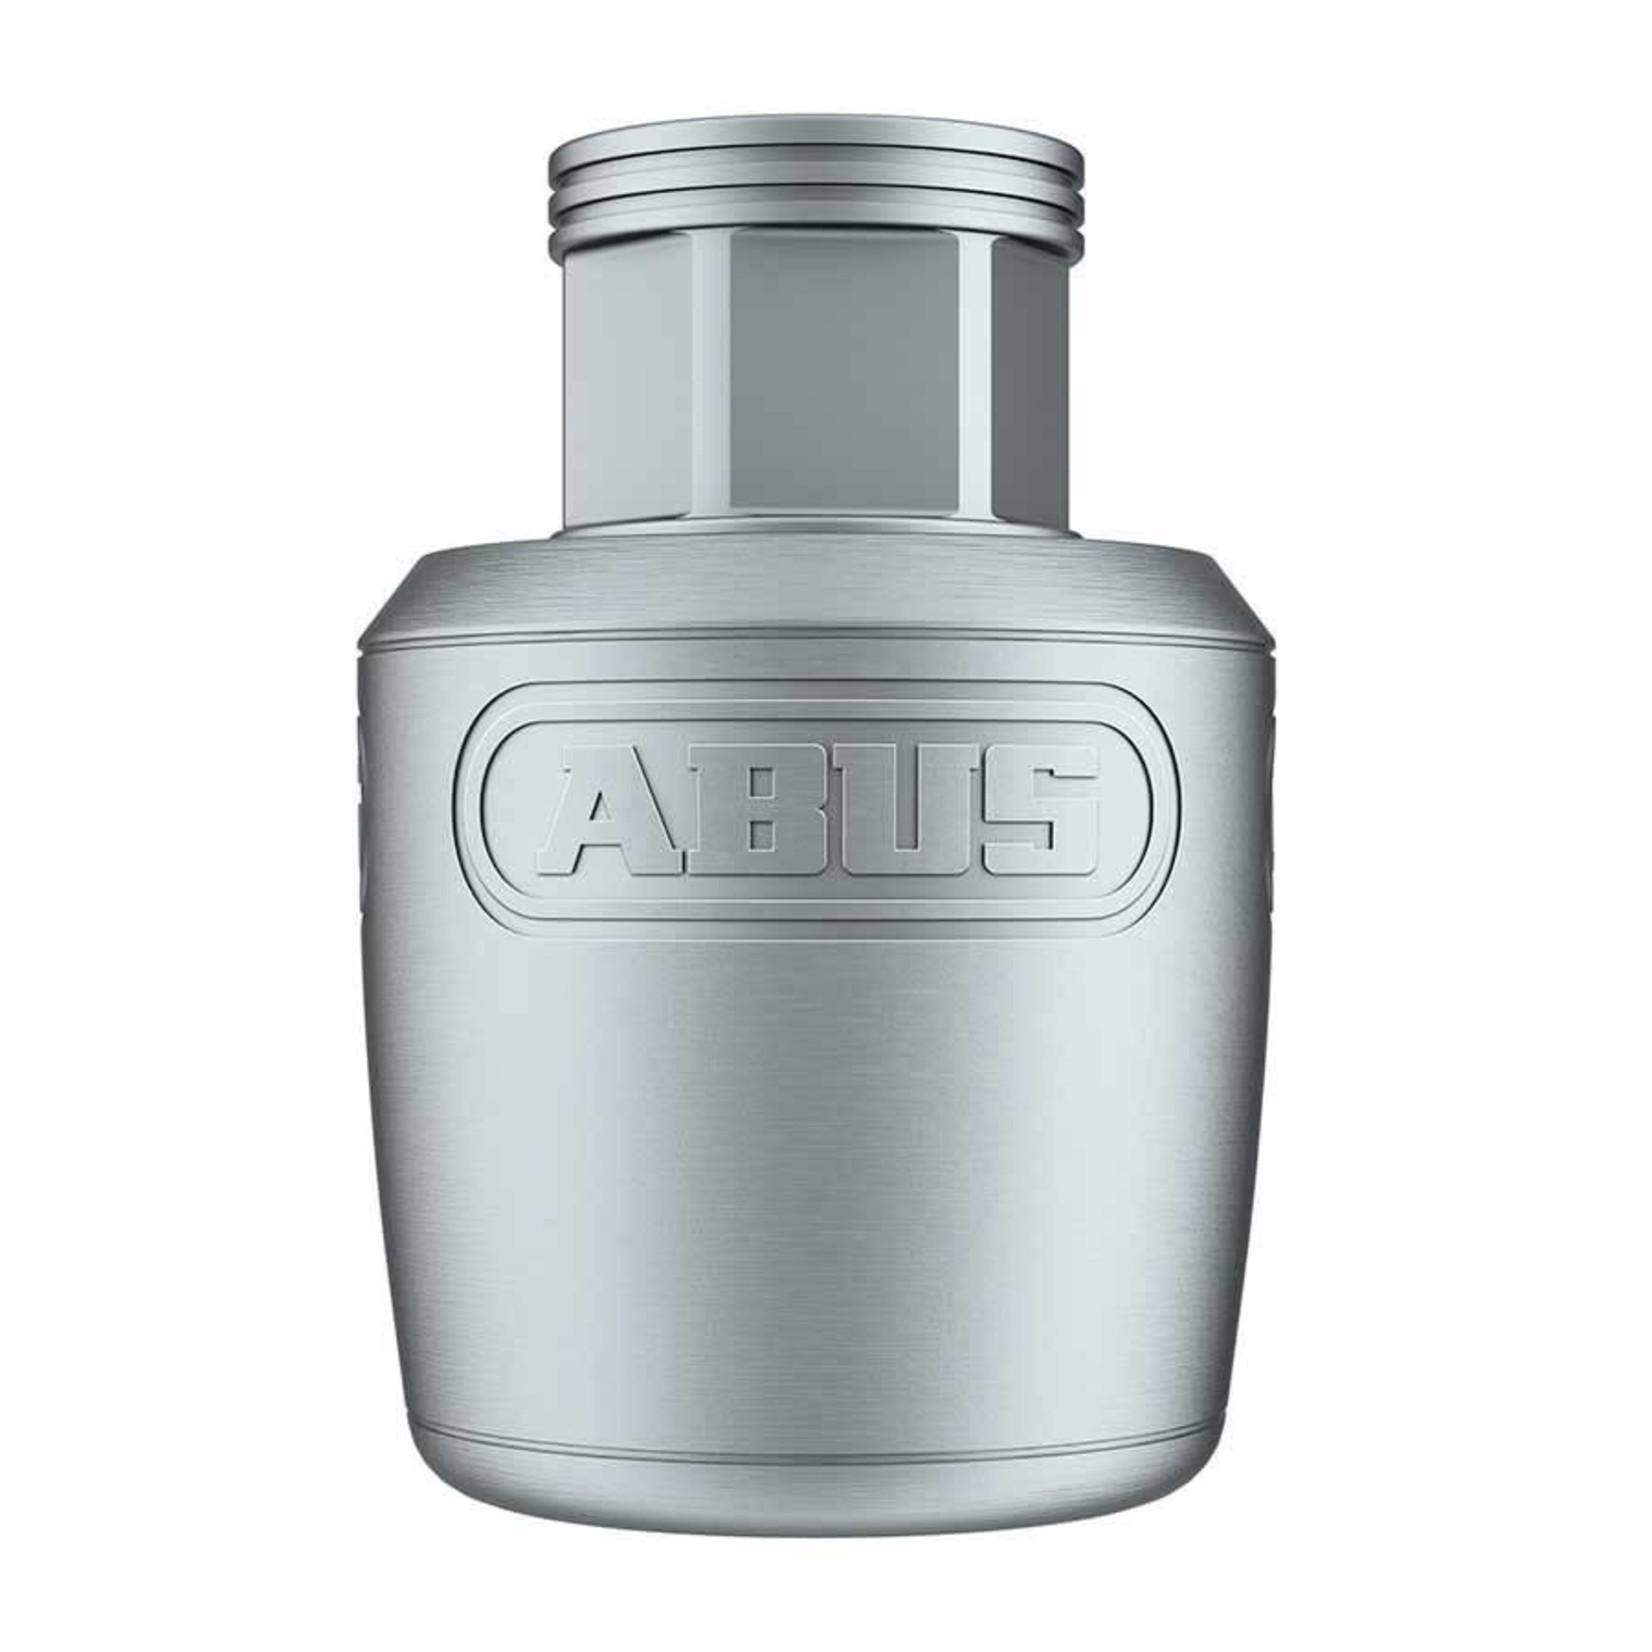 Abus Nutfix Axle Set, Locking skewers, Pair, 100/135mm O.L.D, Silver